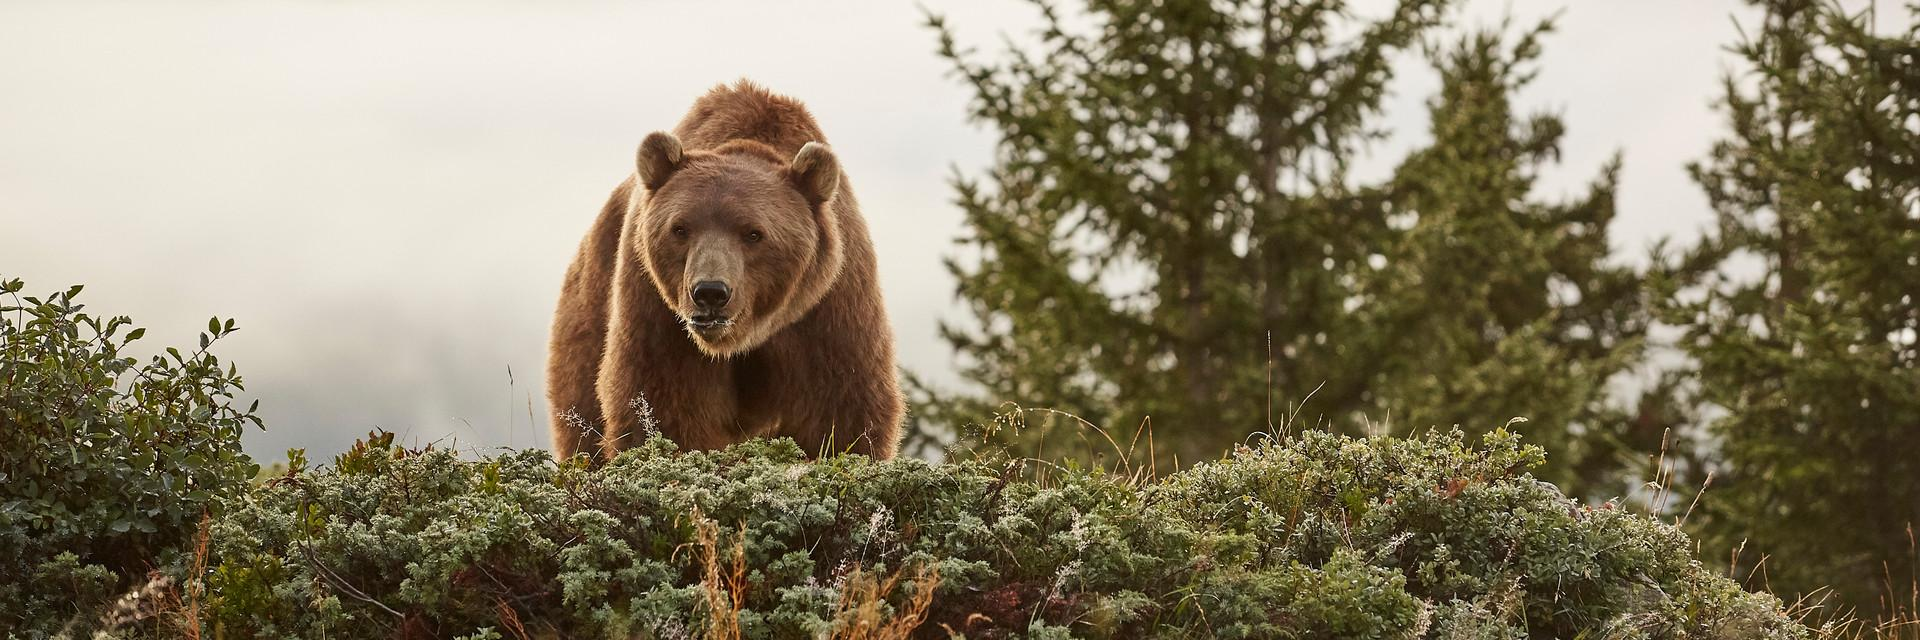 Bear Napa at a sanctuary